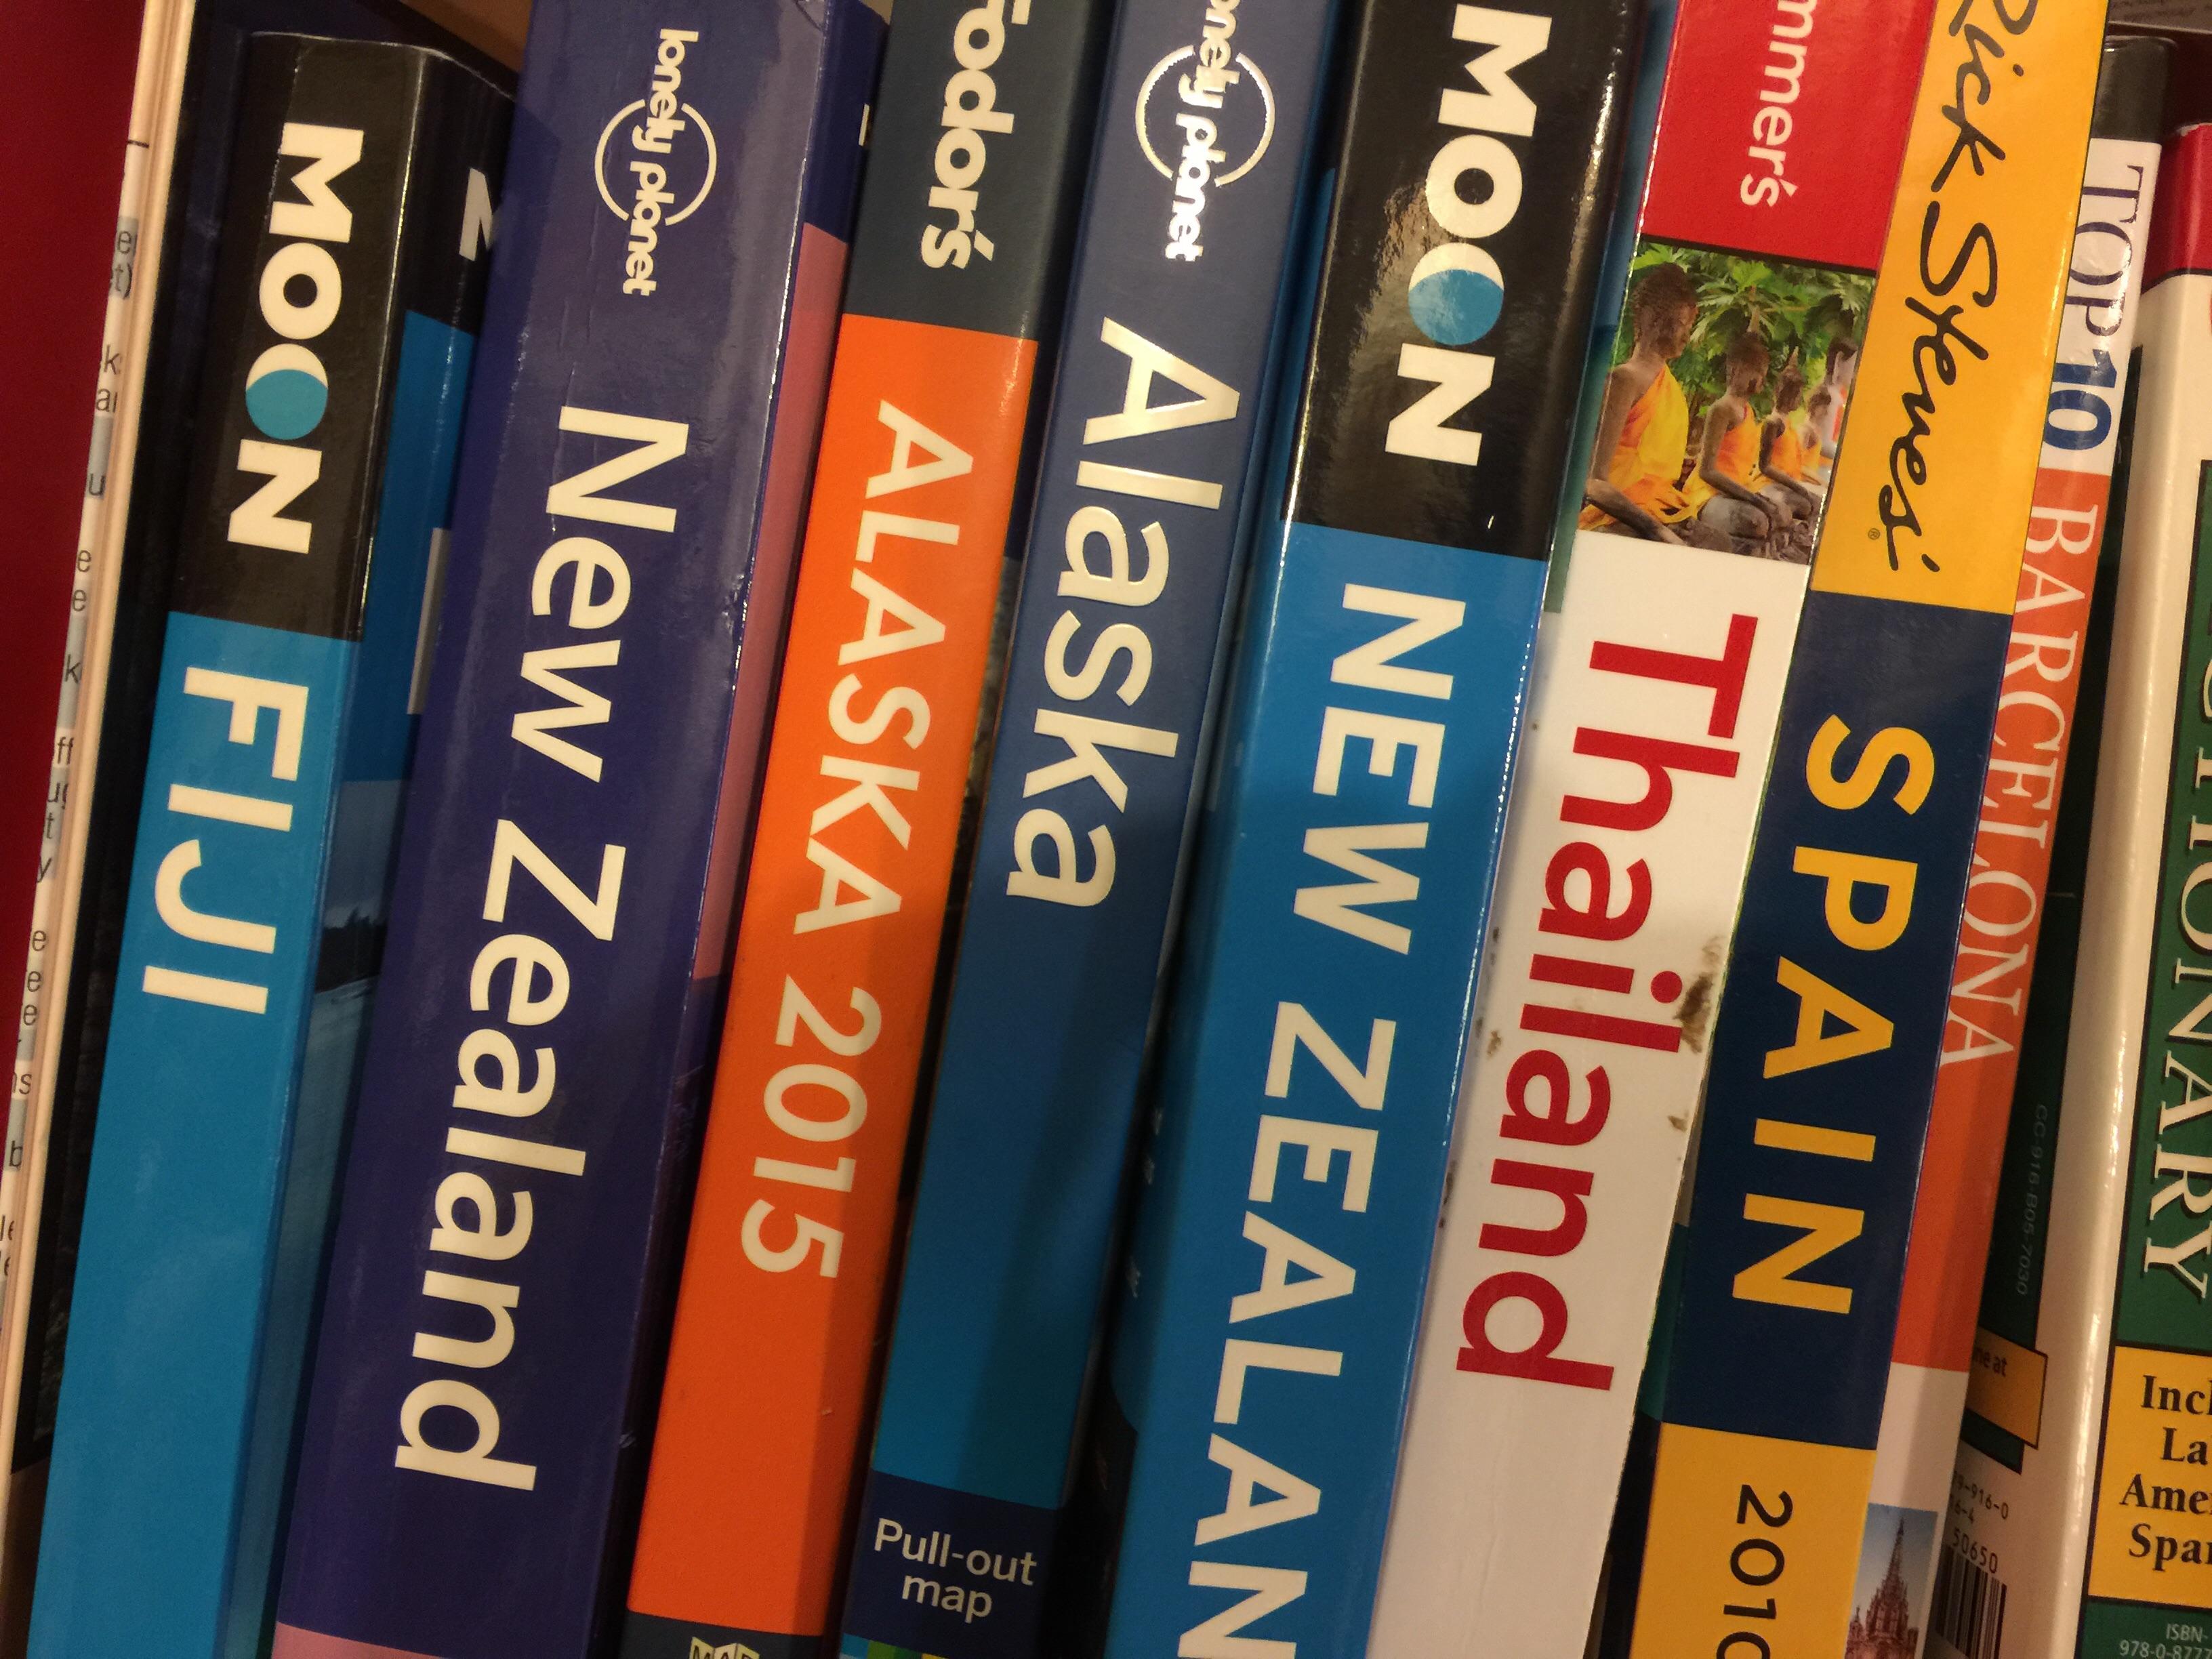 Aaa Travel Books Free